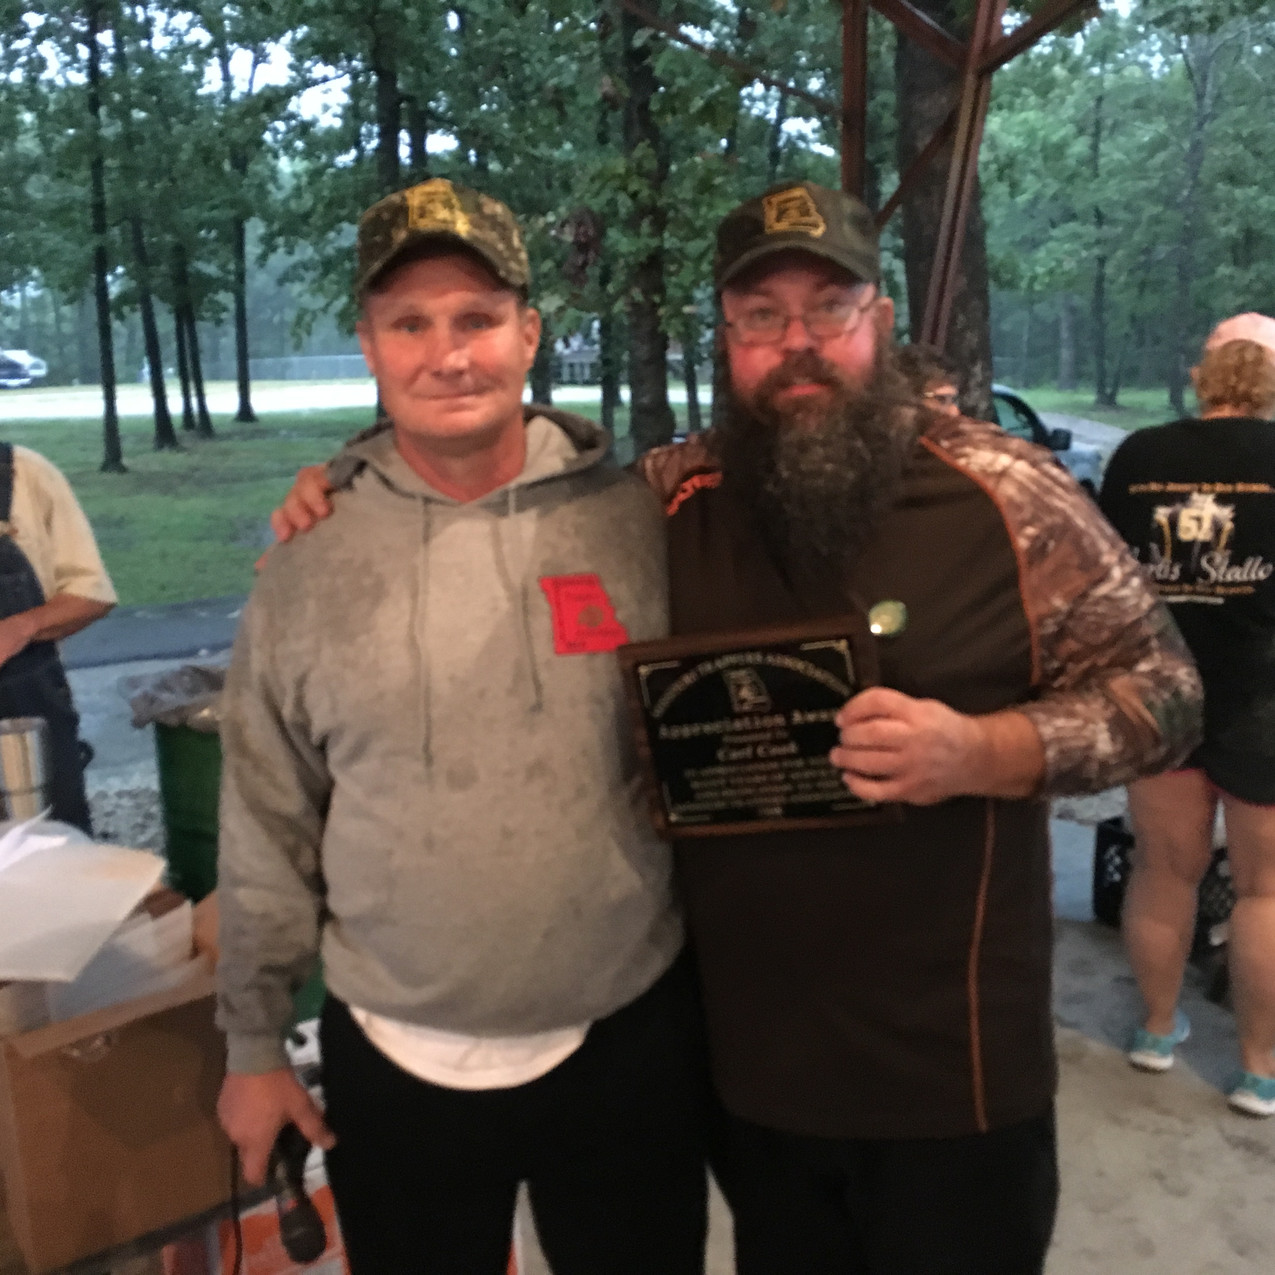 Carl Cook, Appreciation Award